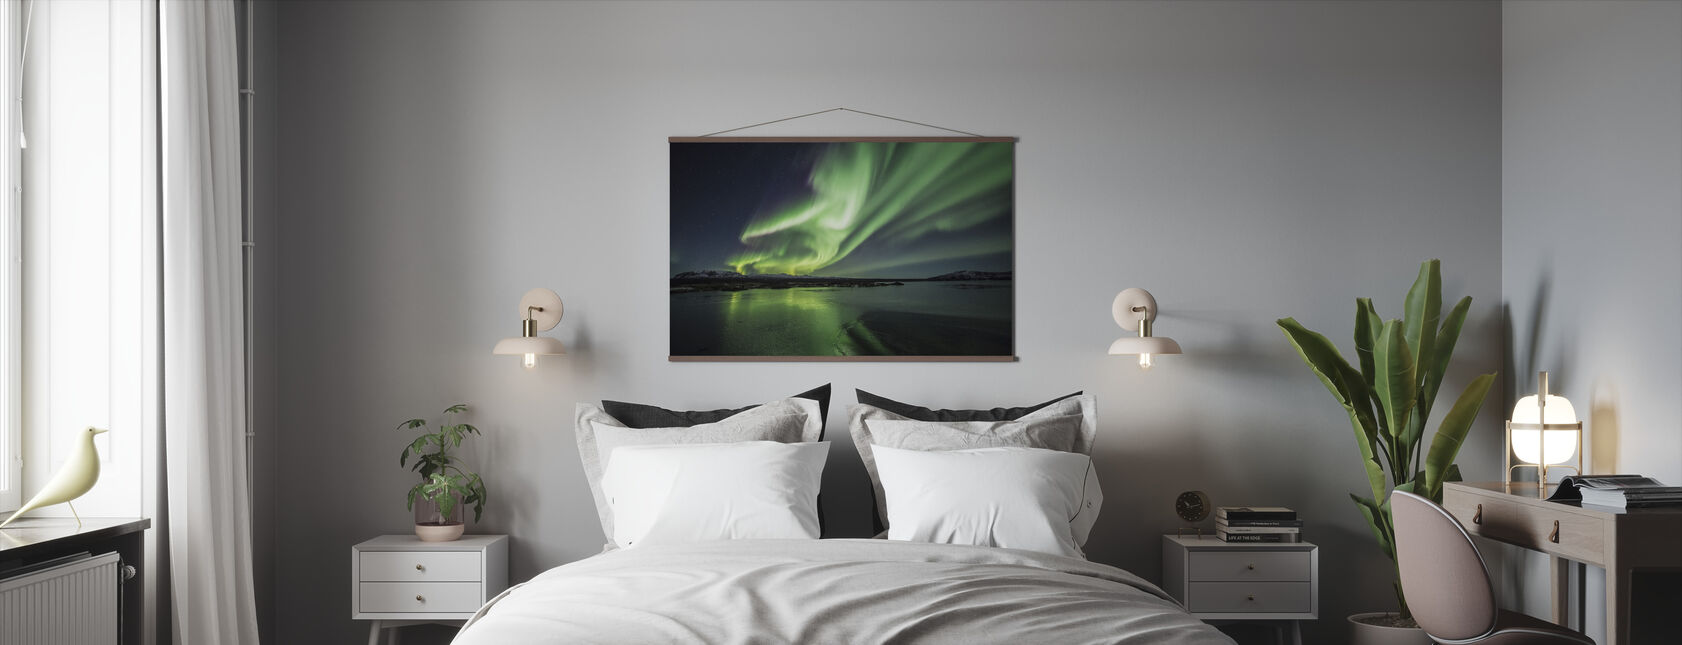 Lumoava Aurora Borealis - Juliste - Makuuhuone